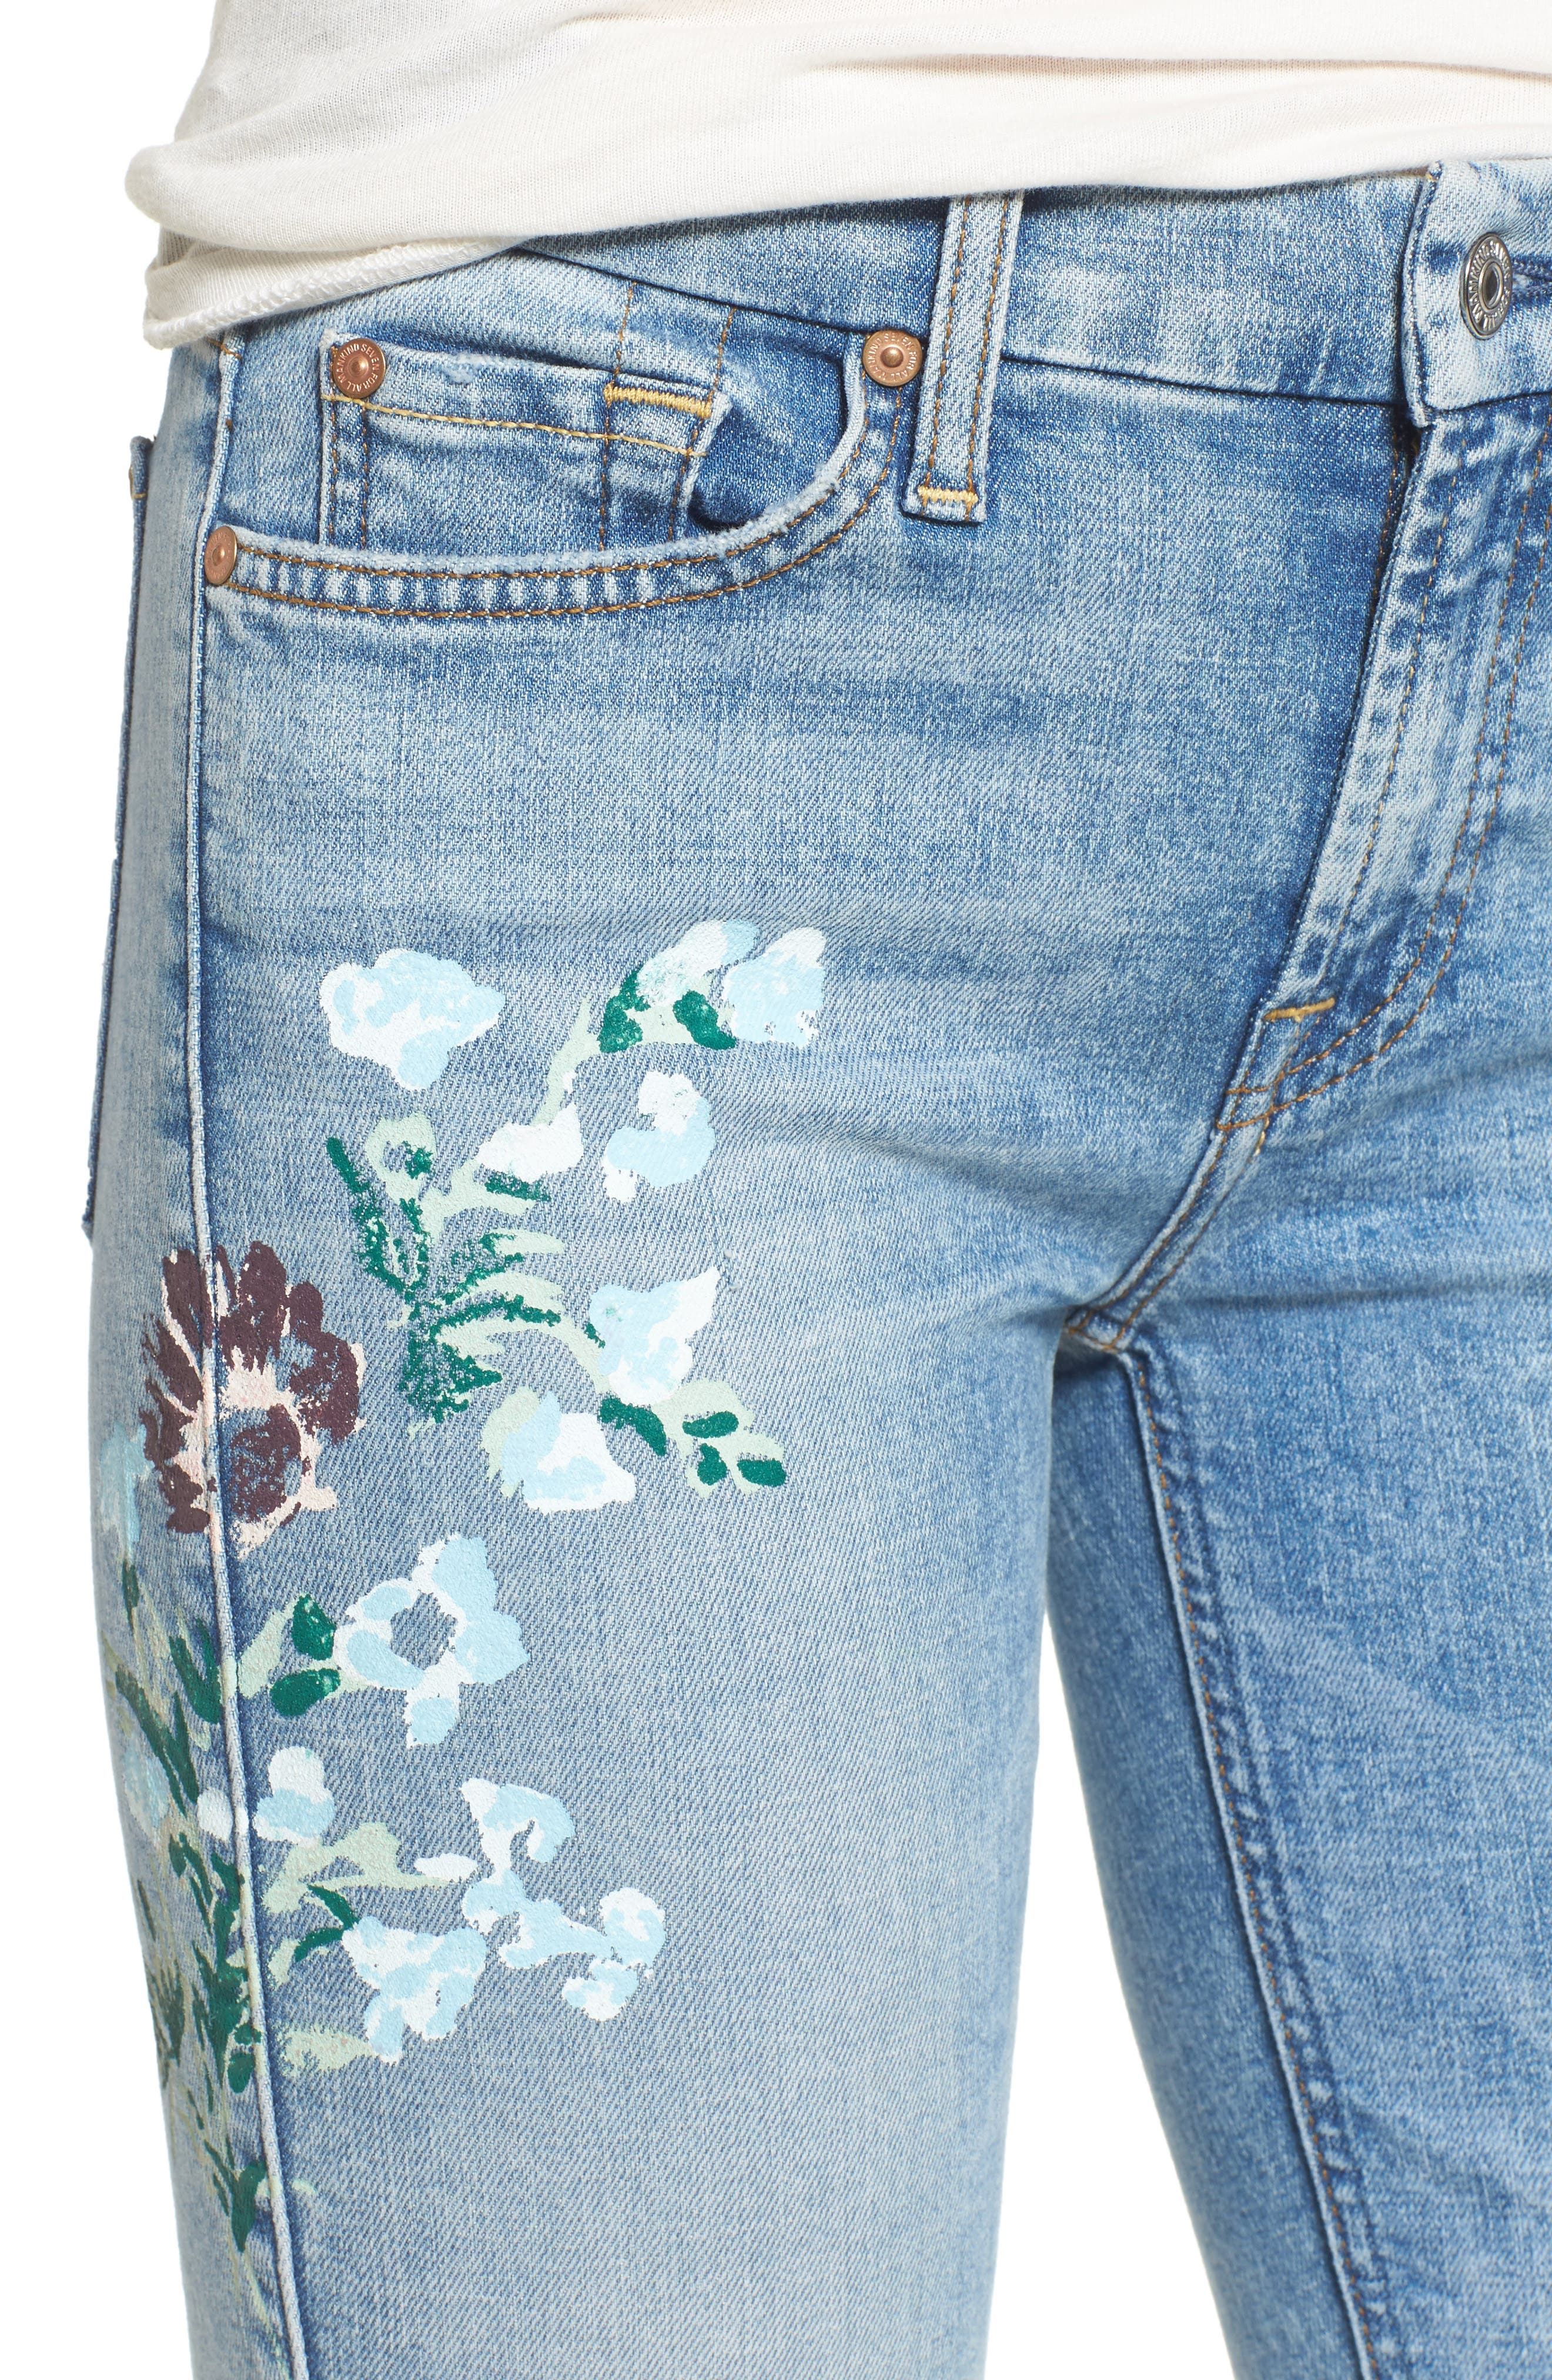 Embellished & Ripped Ankle Skinny Jeans,                             Alternate thumbnail 4, color,                             Radiant Wythe W/ Floral